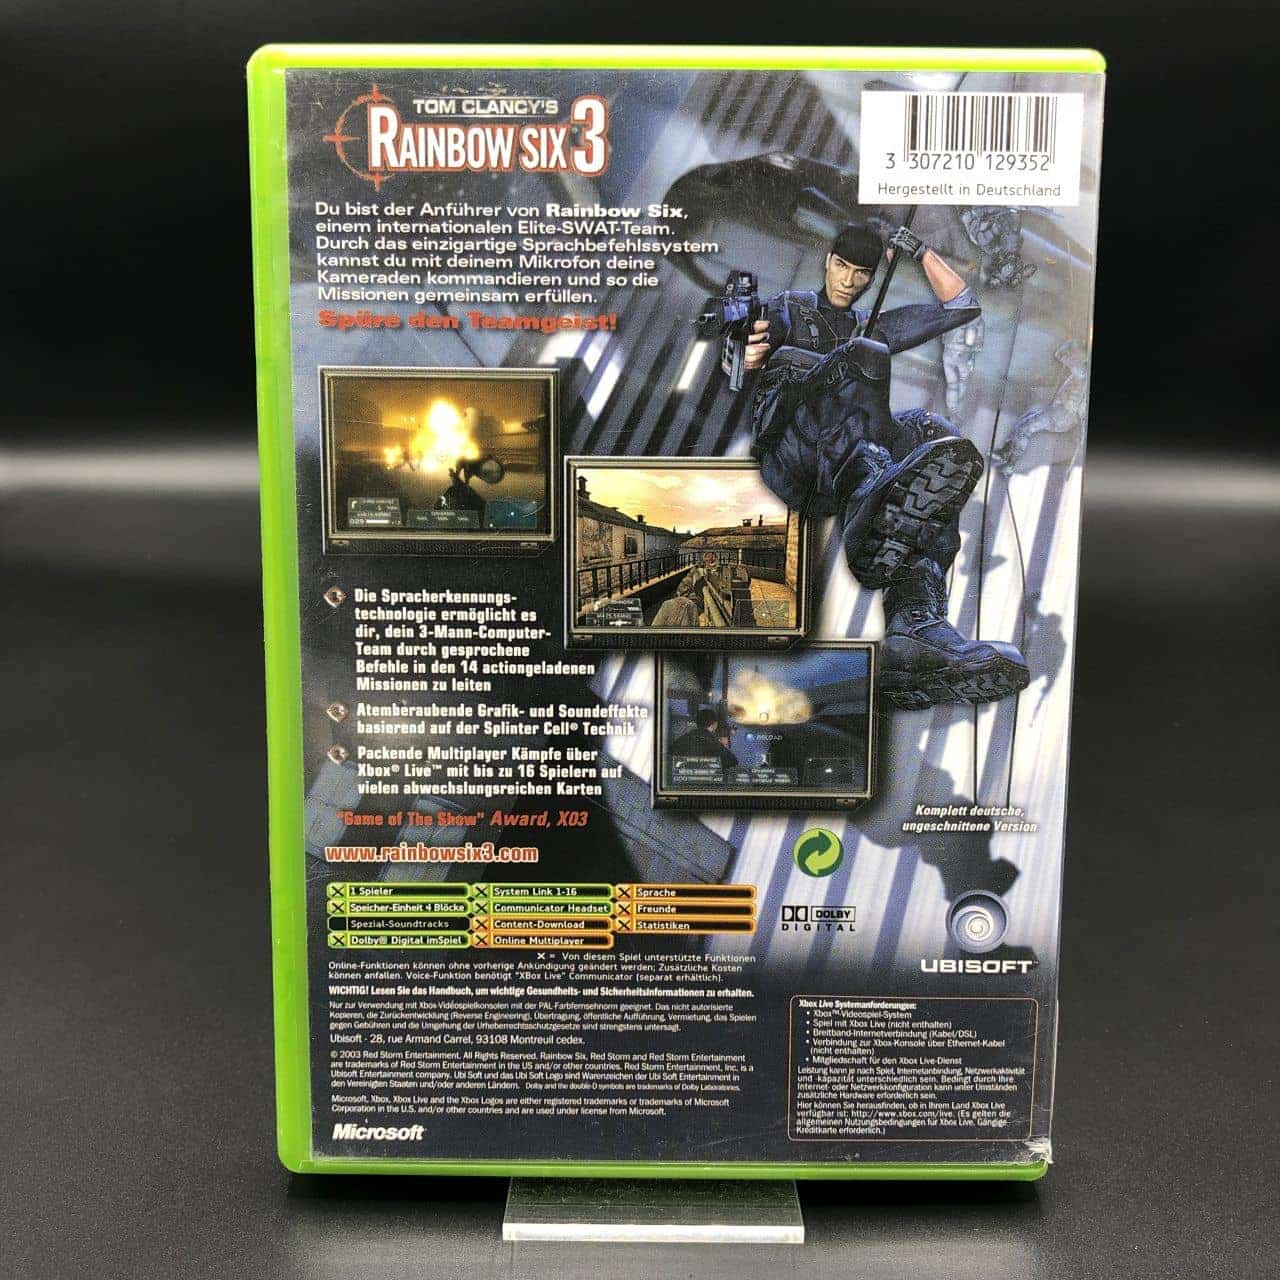 XBC Tom Clancy's Rainbow Six 3 (Komplett) (Gut) Xbox Classic